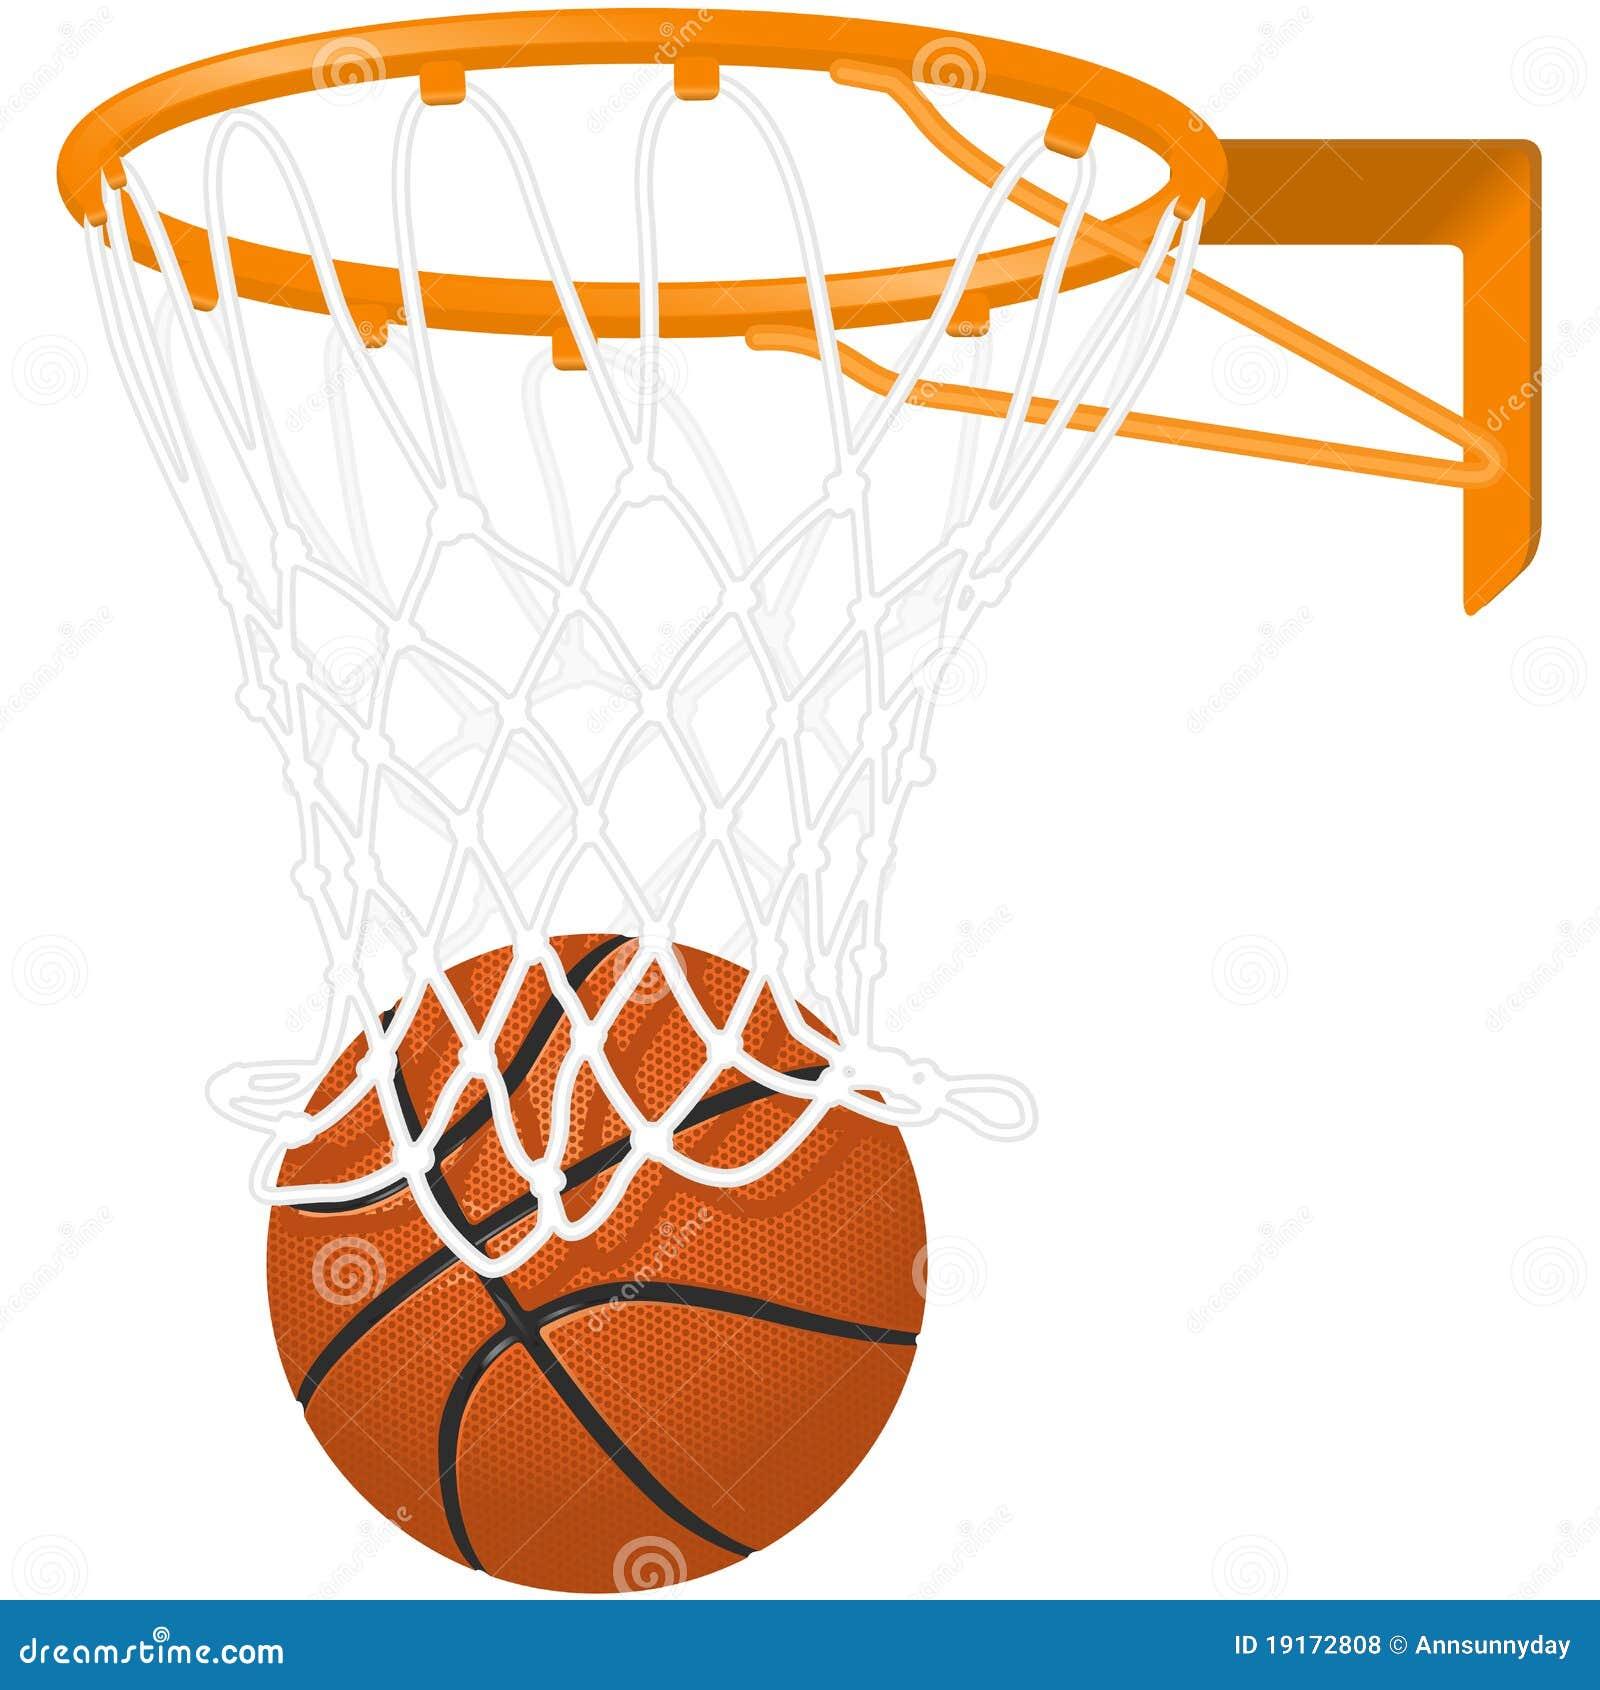 basketball hoop and ball stock vector illustration of hoop 19172808